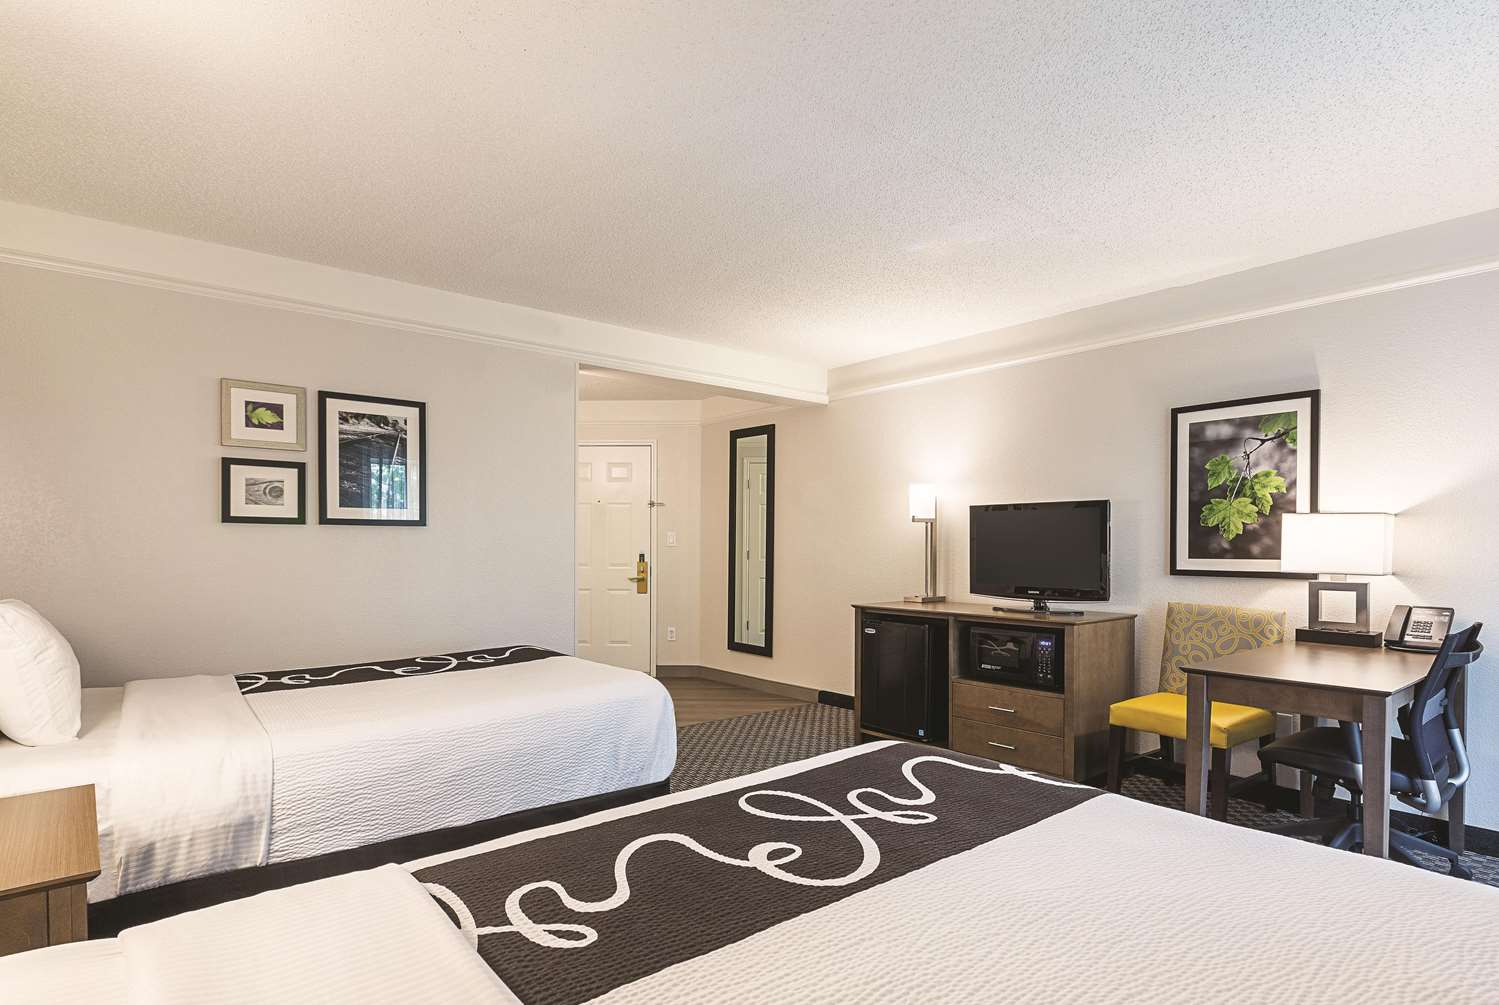 La Quinta Inn Amp Suites West Plano Tx See Discounts